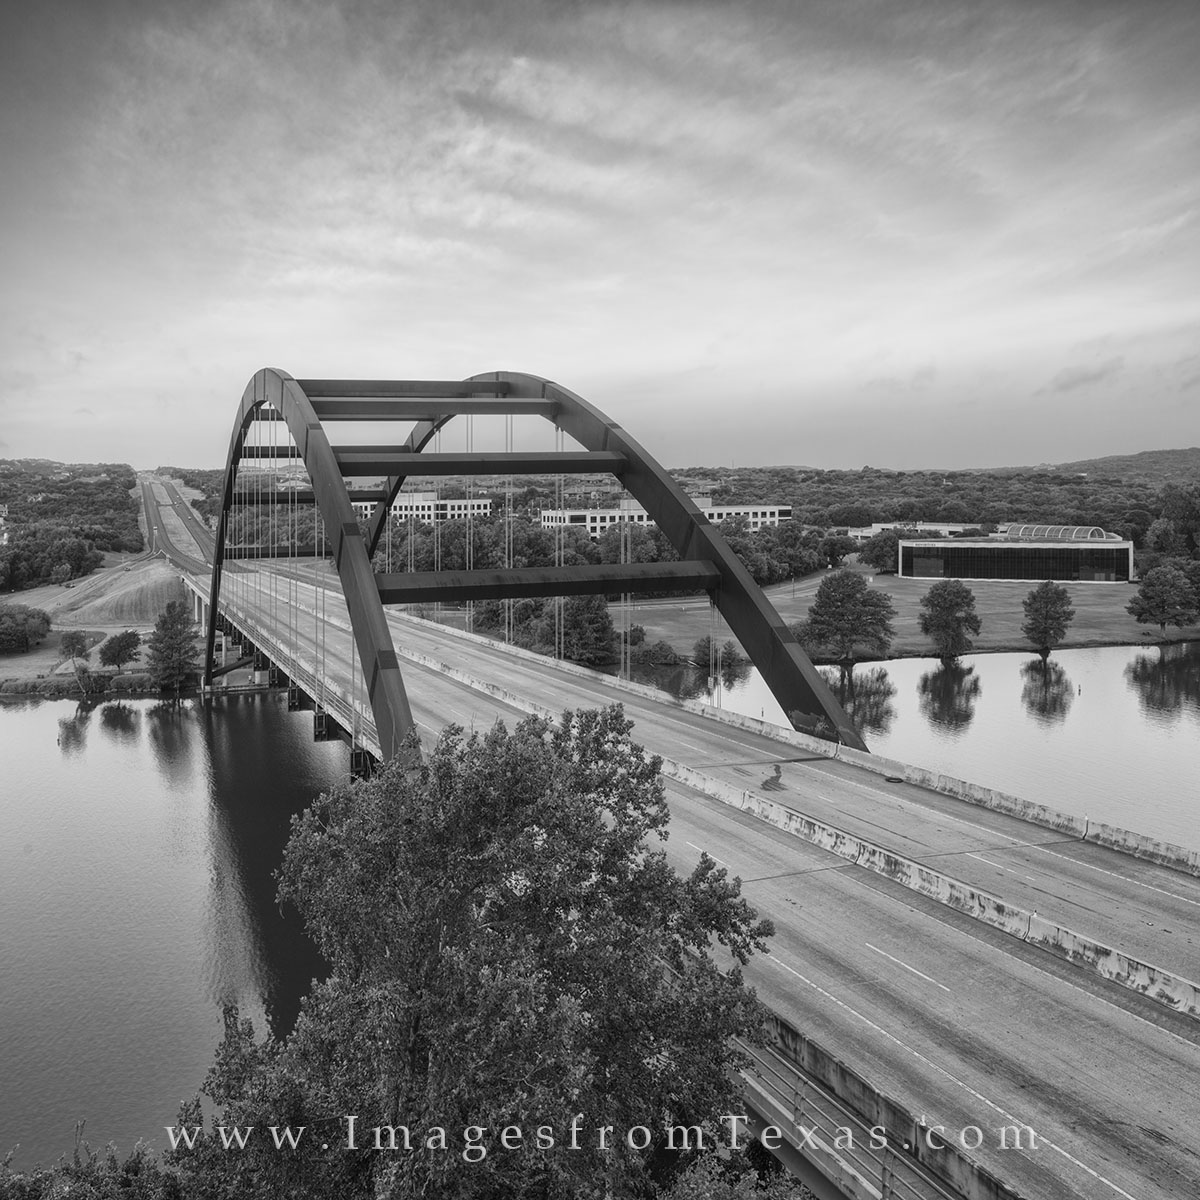 360 bridge, pennybacker bridge, austin bridges, 360 bridge images, pennybacker bridge images. austin skyline, austin icons, austin images, austin texas, photo